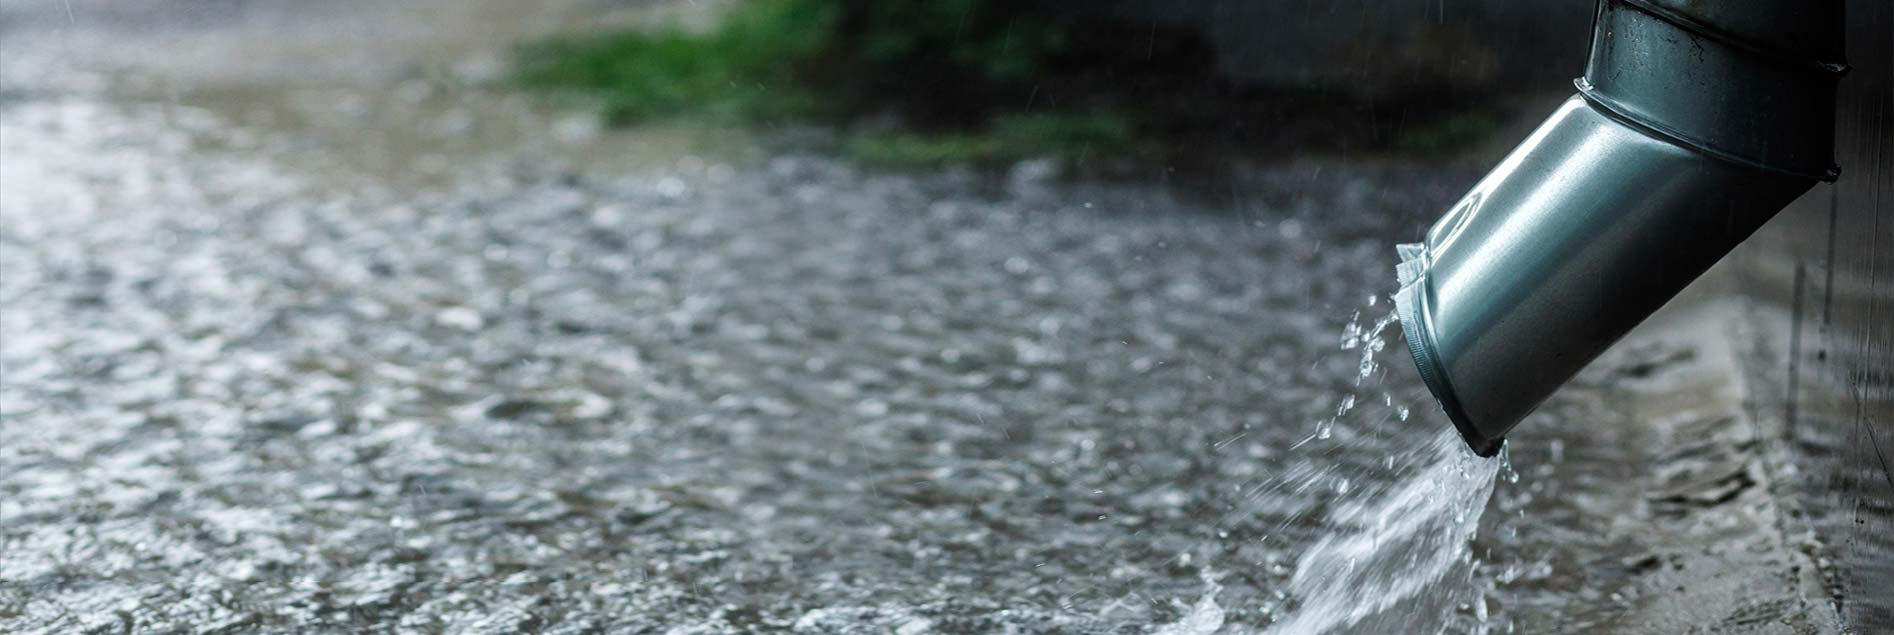 Catch Rainwater